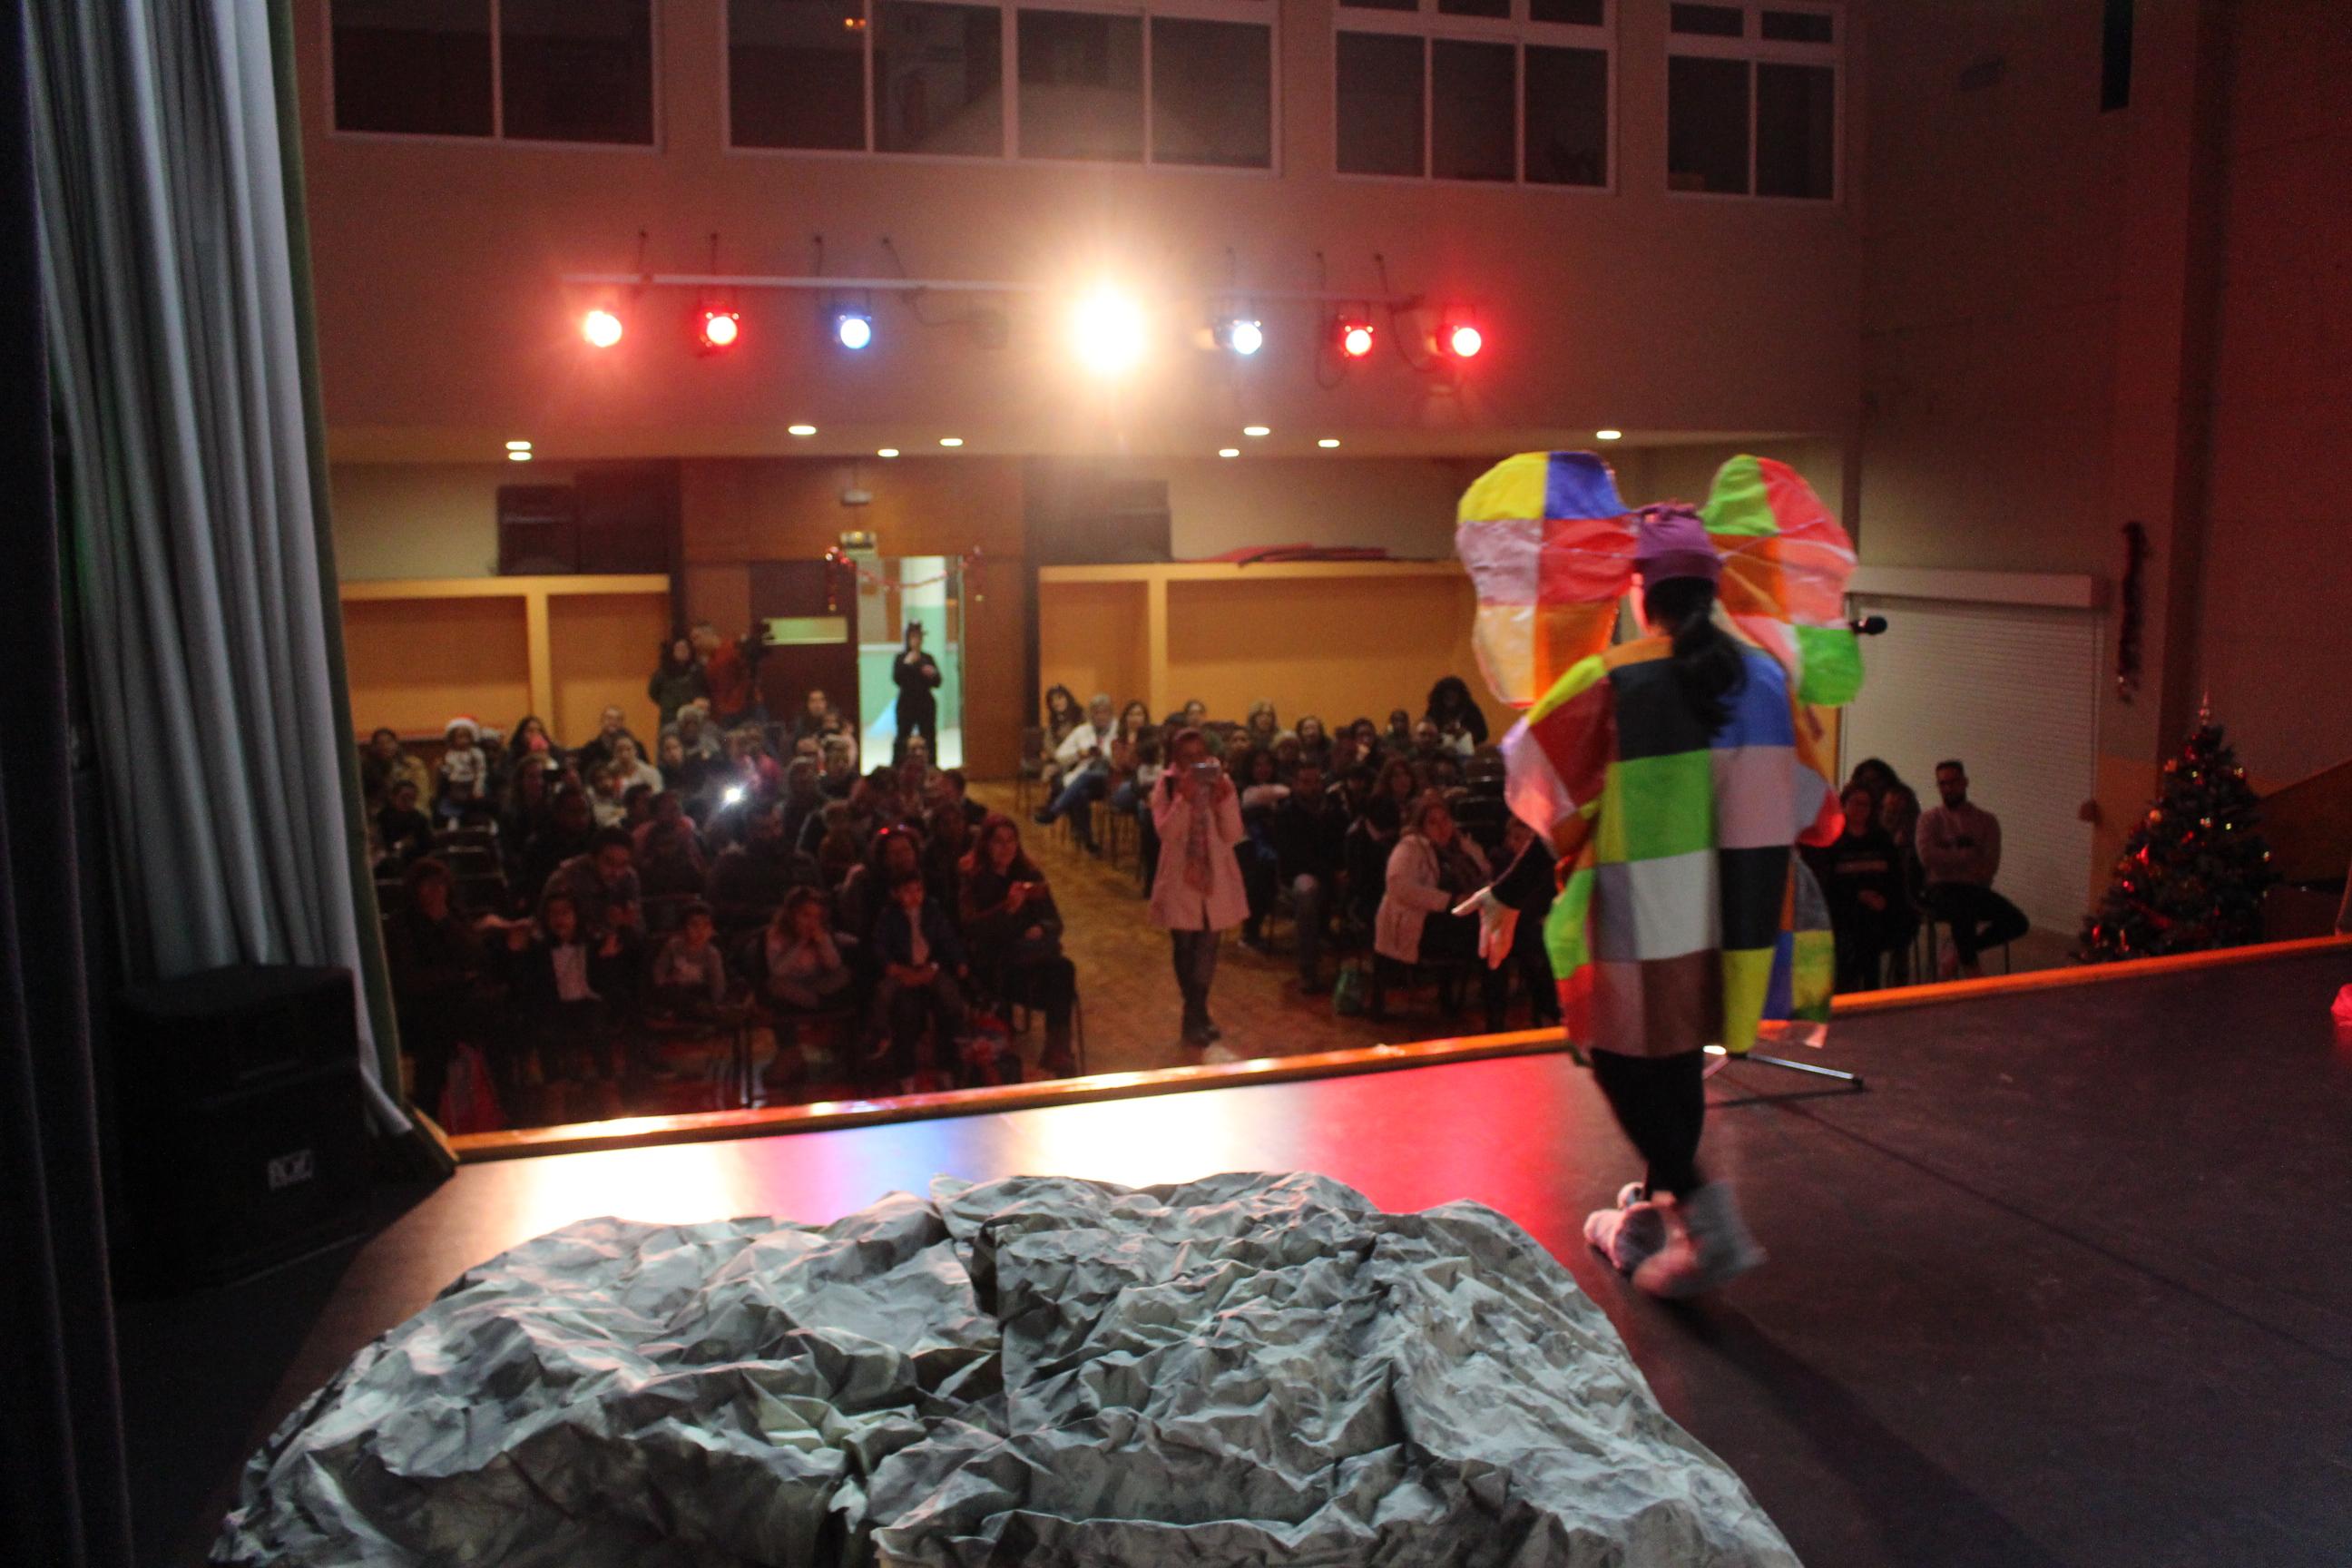 Festa de Natal Creche da SFRAA – Quinta de S. Miguel